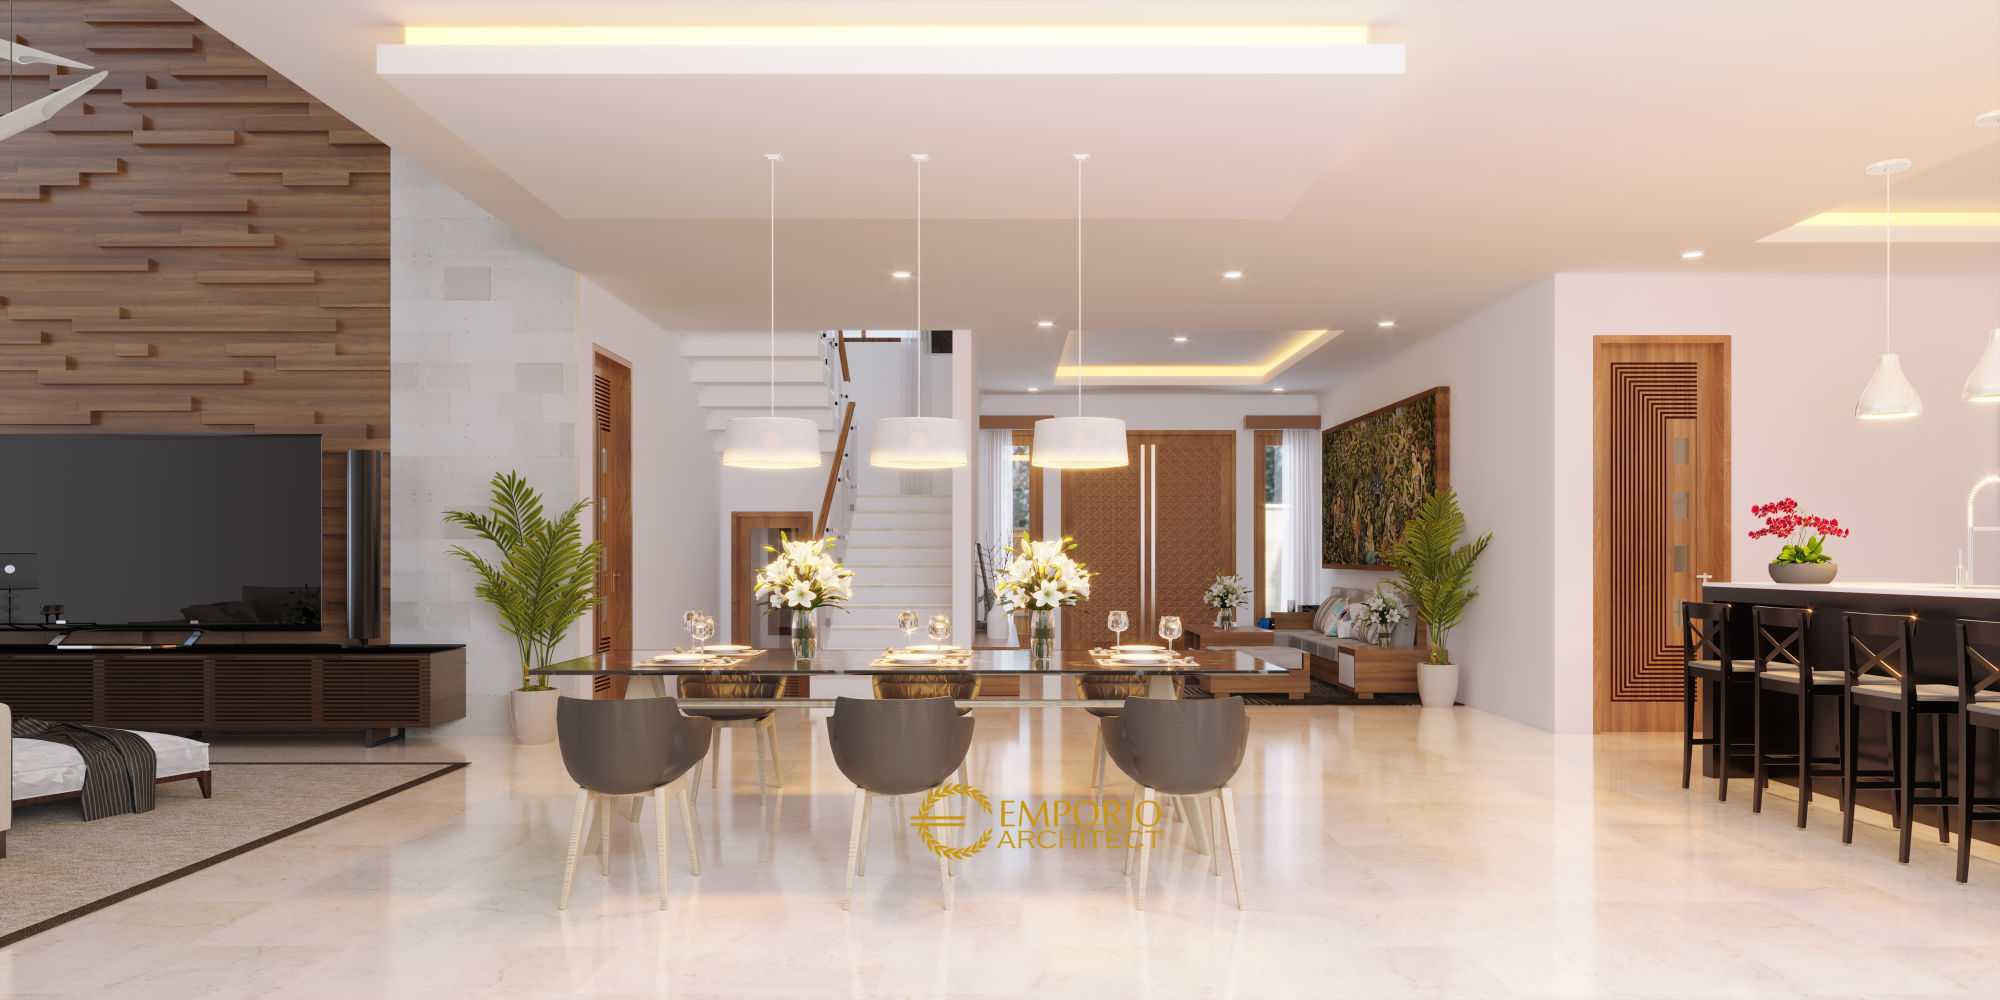 Emporio Architect Jasa Arsitek Makassar Desain Rumah Villa Bali Tropis 683 @ Makassar Makassar, Kota Makassar, Sulawesi Selatan, Indonesia Makassar, Kota Makassar, Sulawesi Selatan, Indonesia Emporio-Architect-Jasa-Arsitek-Makassar-Desain-Rumah-Villa-Bali-Tropis-683-Makassar  81776